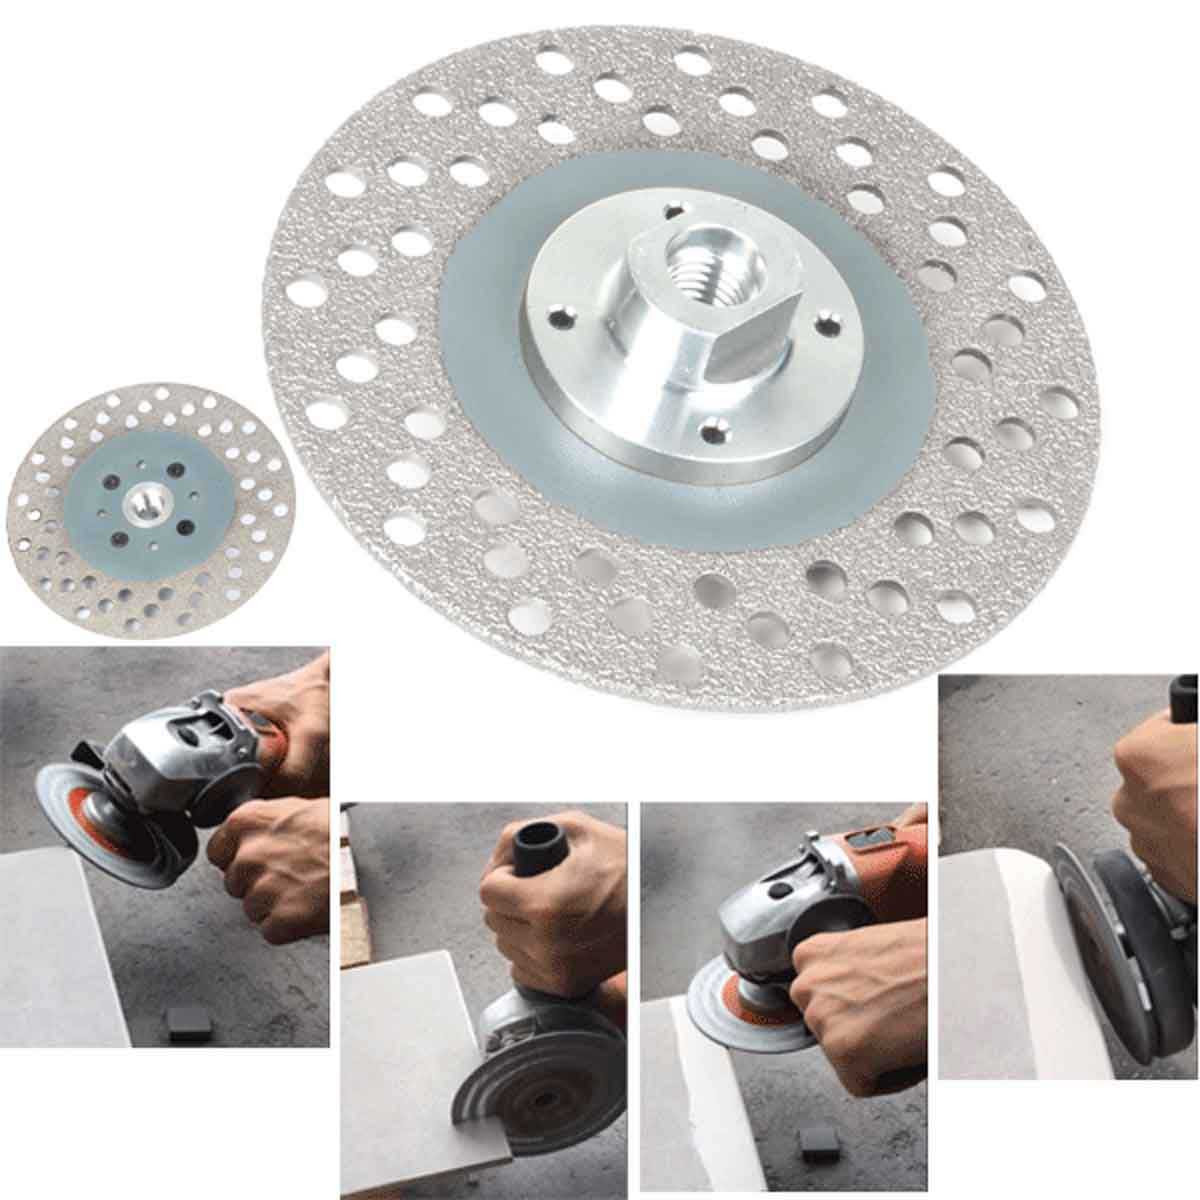 STL125GG Medium Grit Diamond Cutting and Grinding Wheel